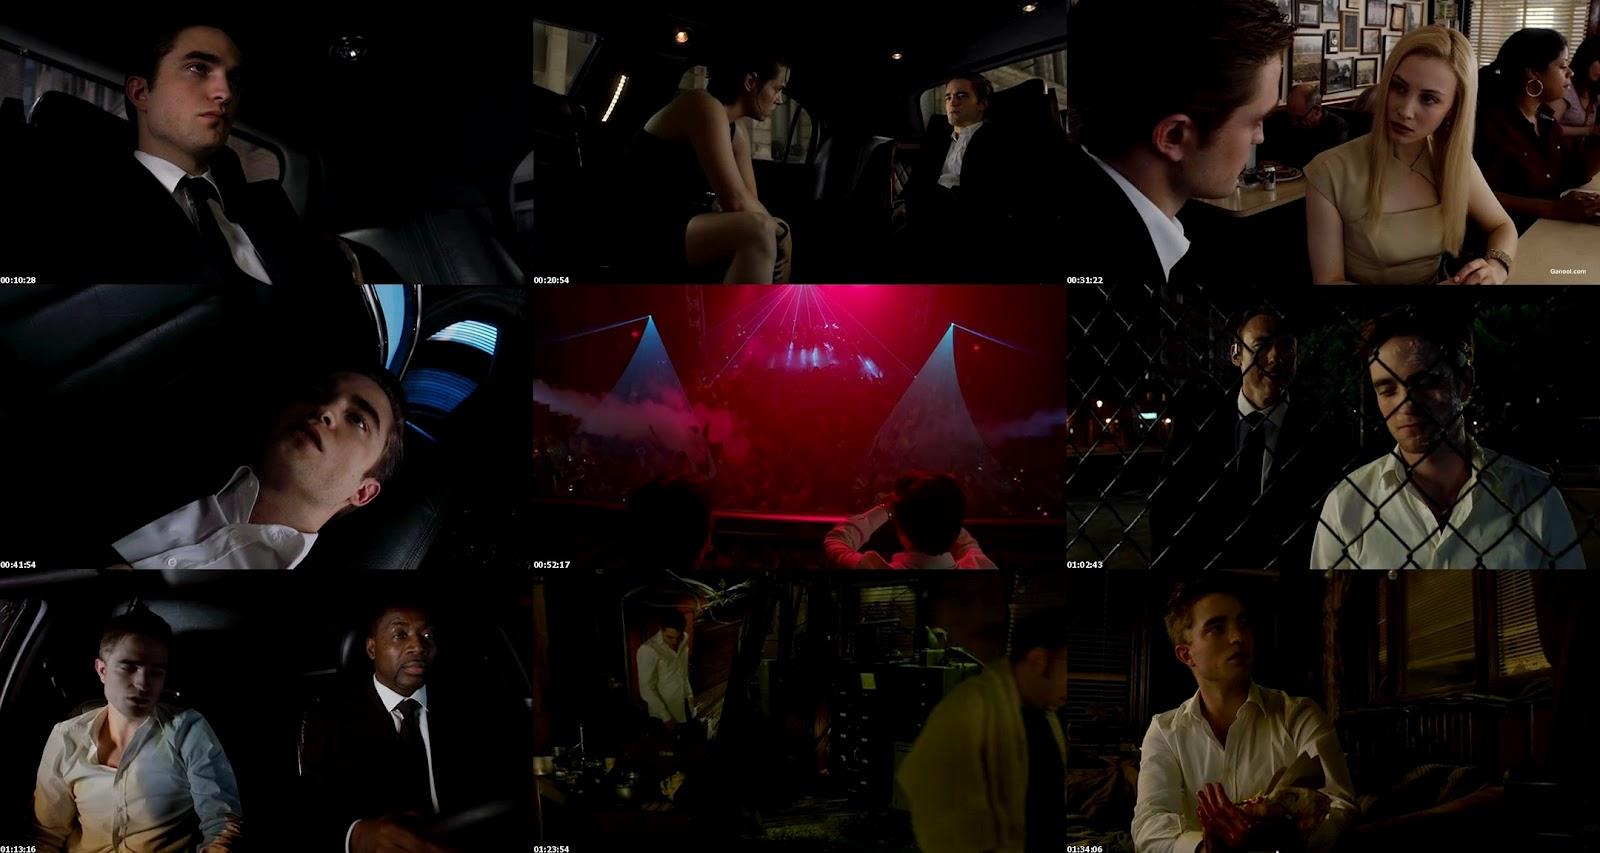 http://2.bp.blogspot.com/-1ABd59Oo5ts/UFp6ppaQB3I/AAAAAAAAJCA/S8C7vjhB0ks/s1600/Cosmopolis+(2012)+LiMiTED+DVDRip+Screen.jpg